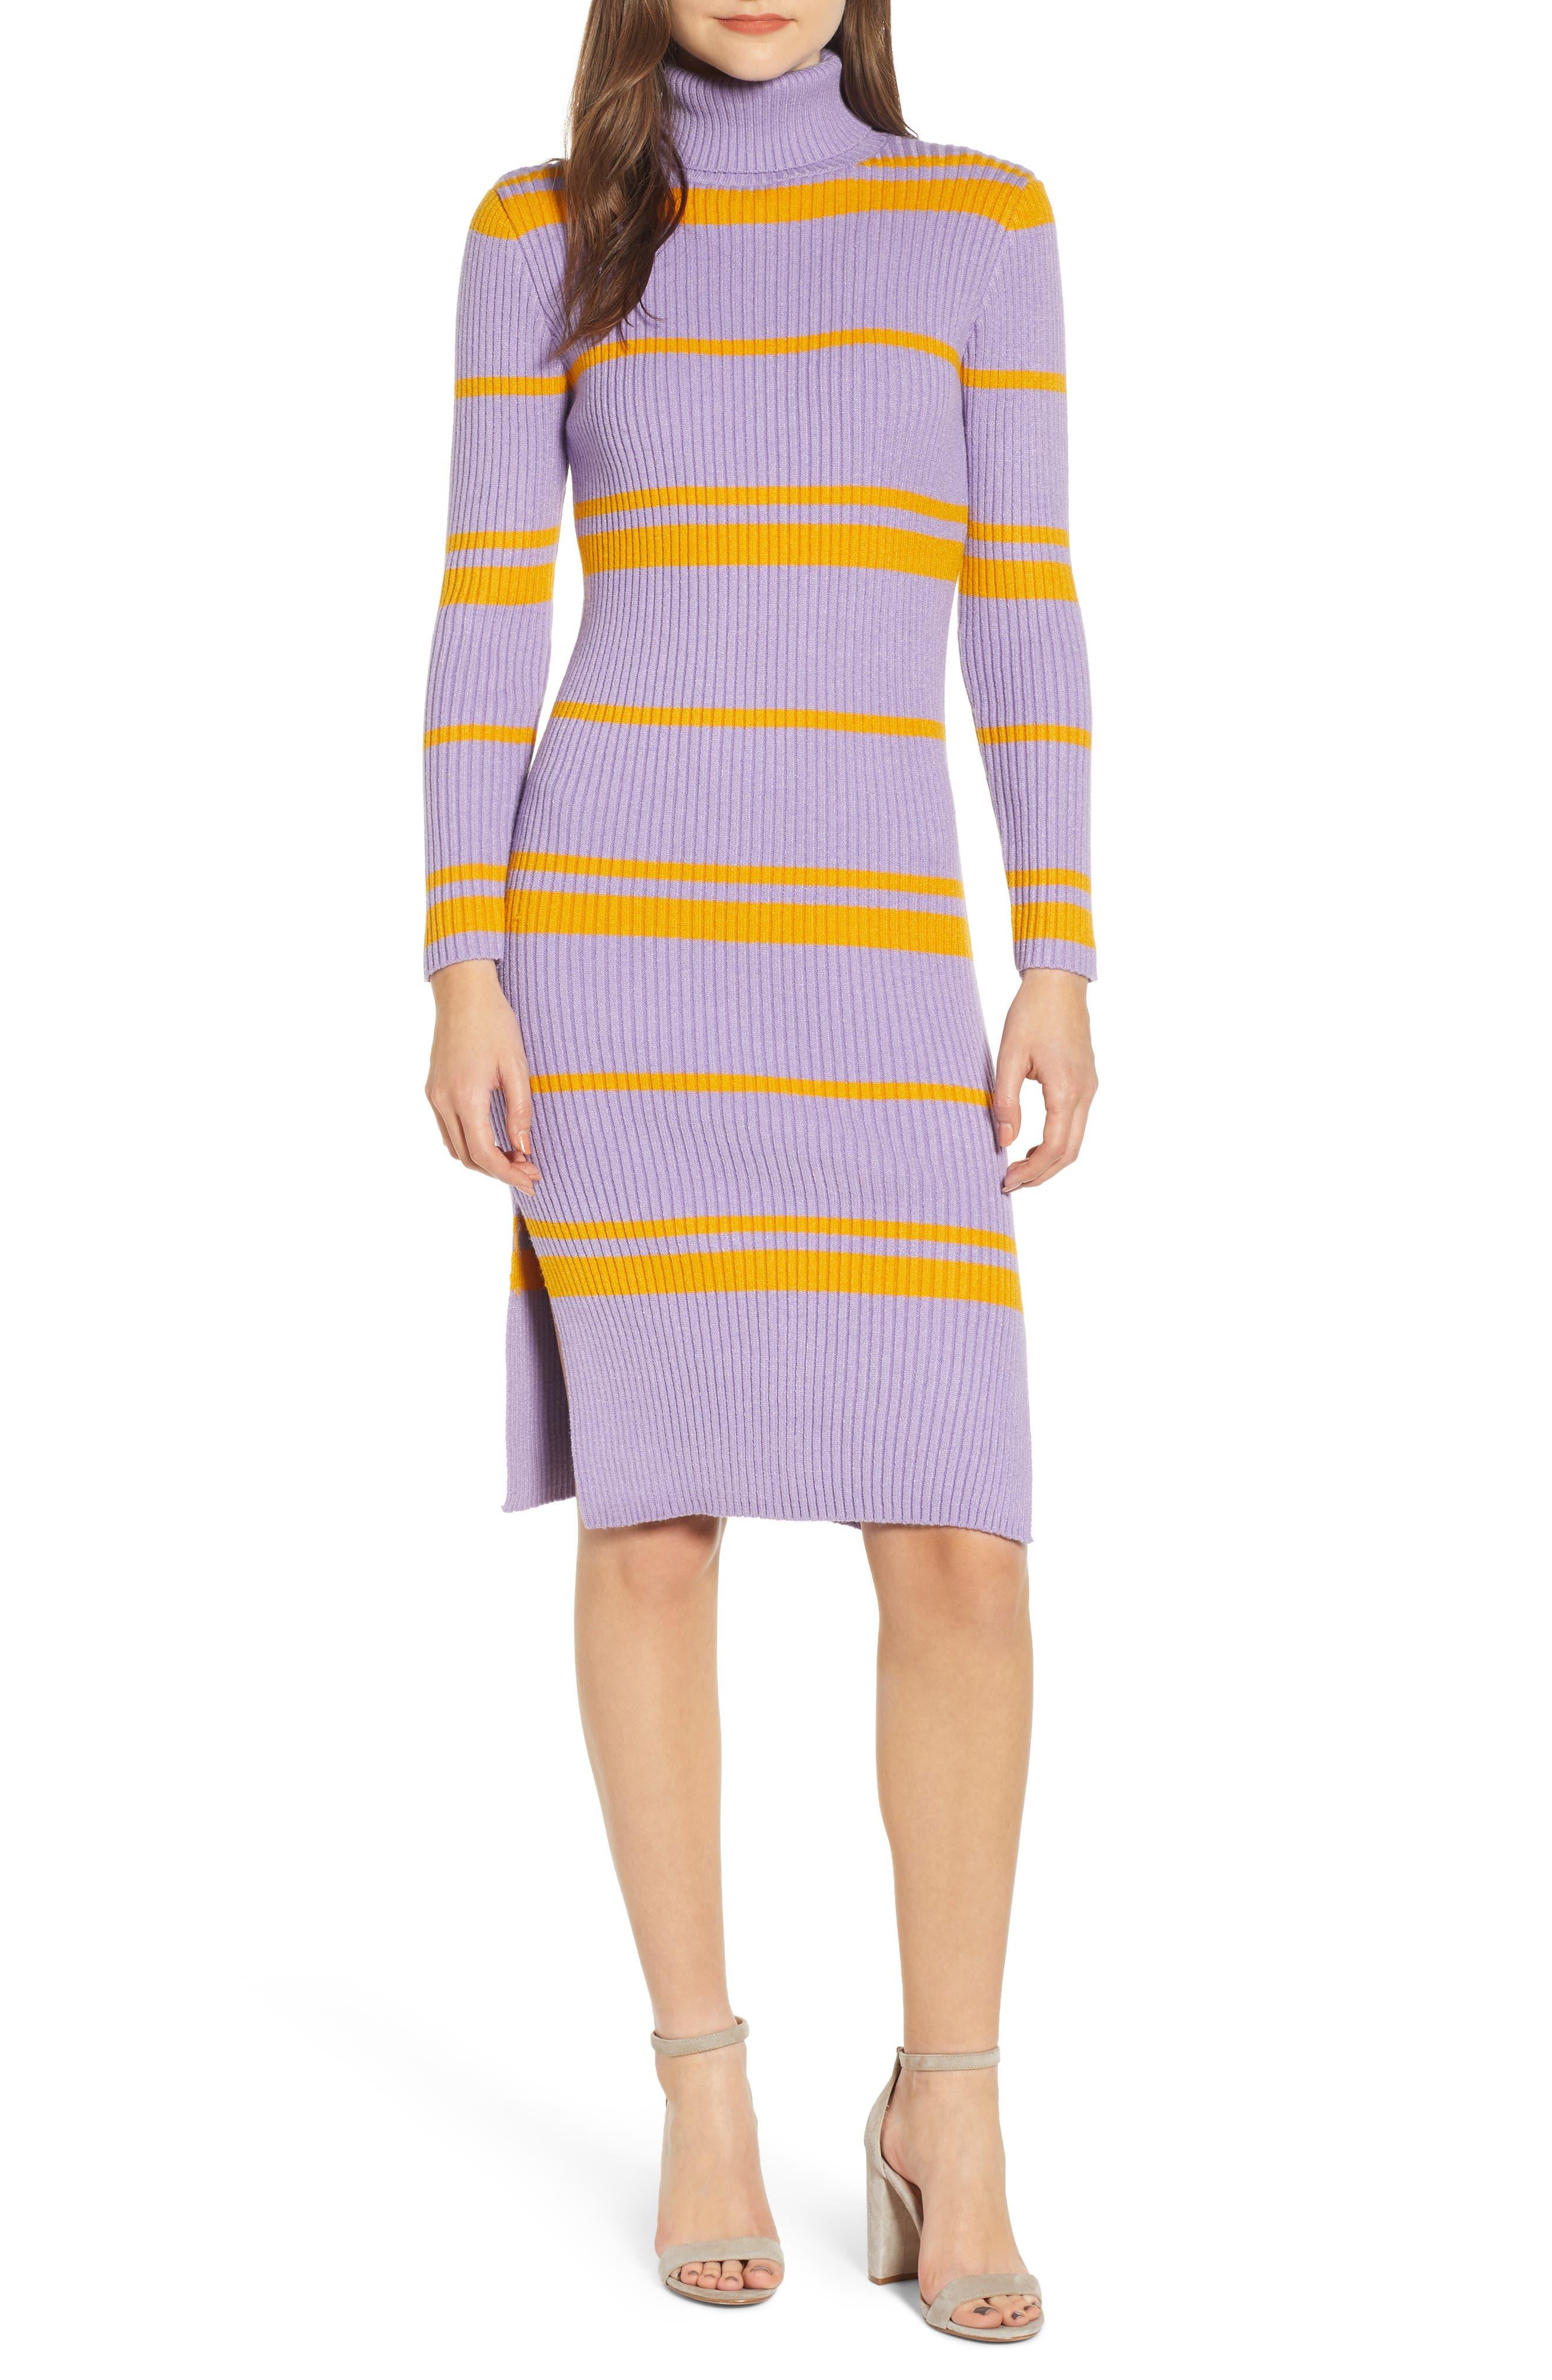 MOON RIVER, Stripe Turtleneck Sweater Dress, Main thumbnail 1, color, 500